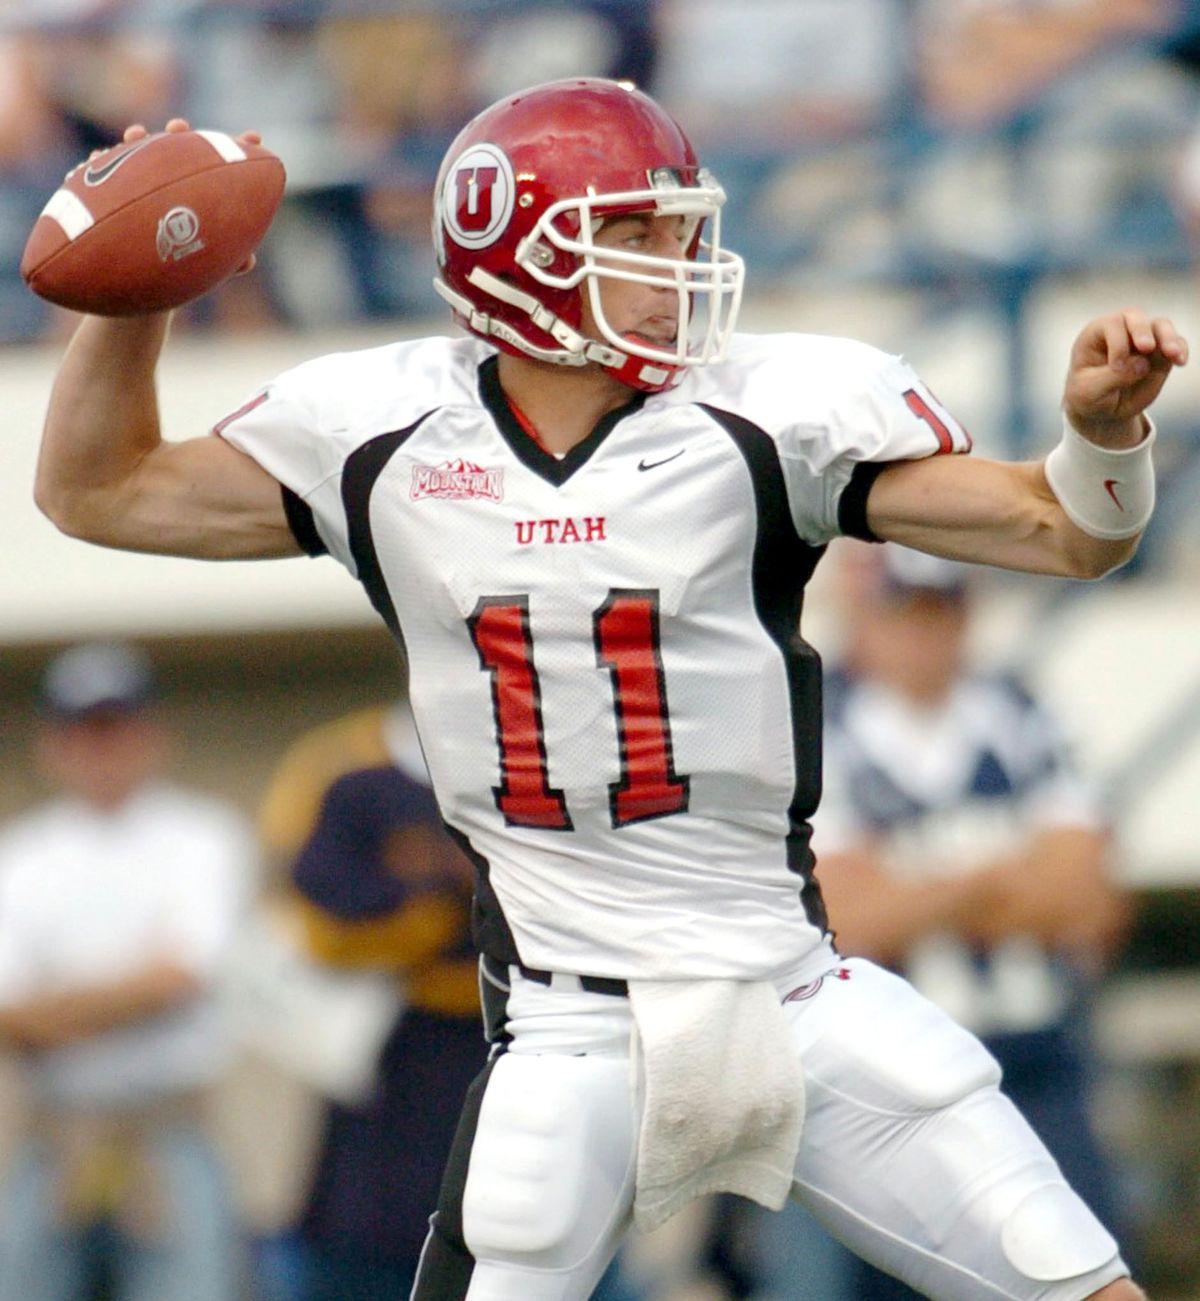 Utah quarterback Alex Smith sets to make a pass during game against Logan Saturday, Sept. 18, 2004.